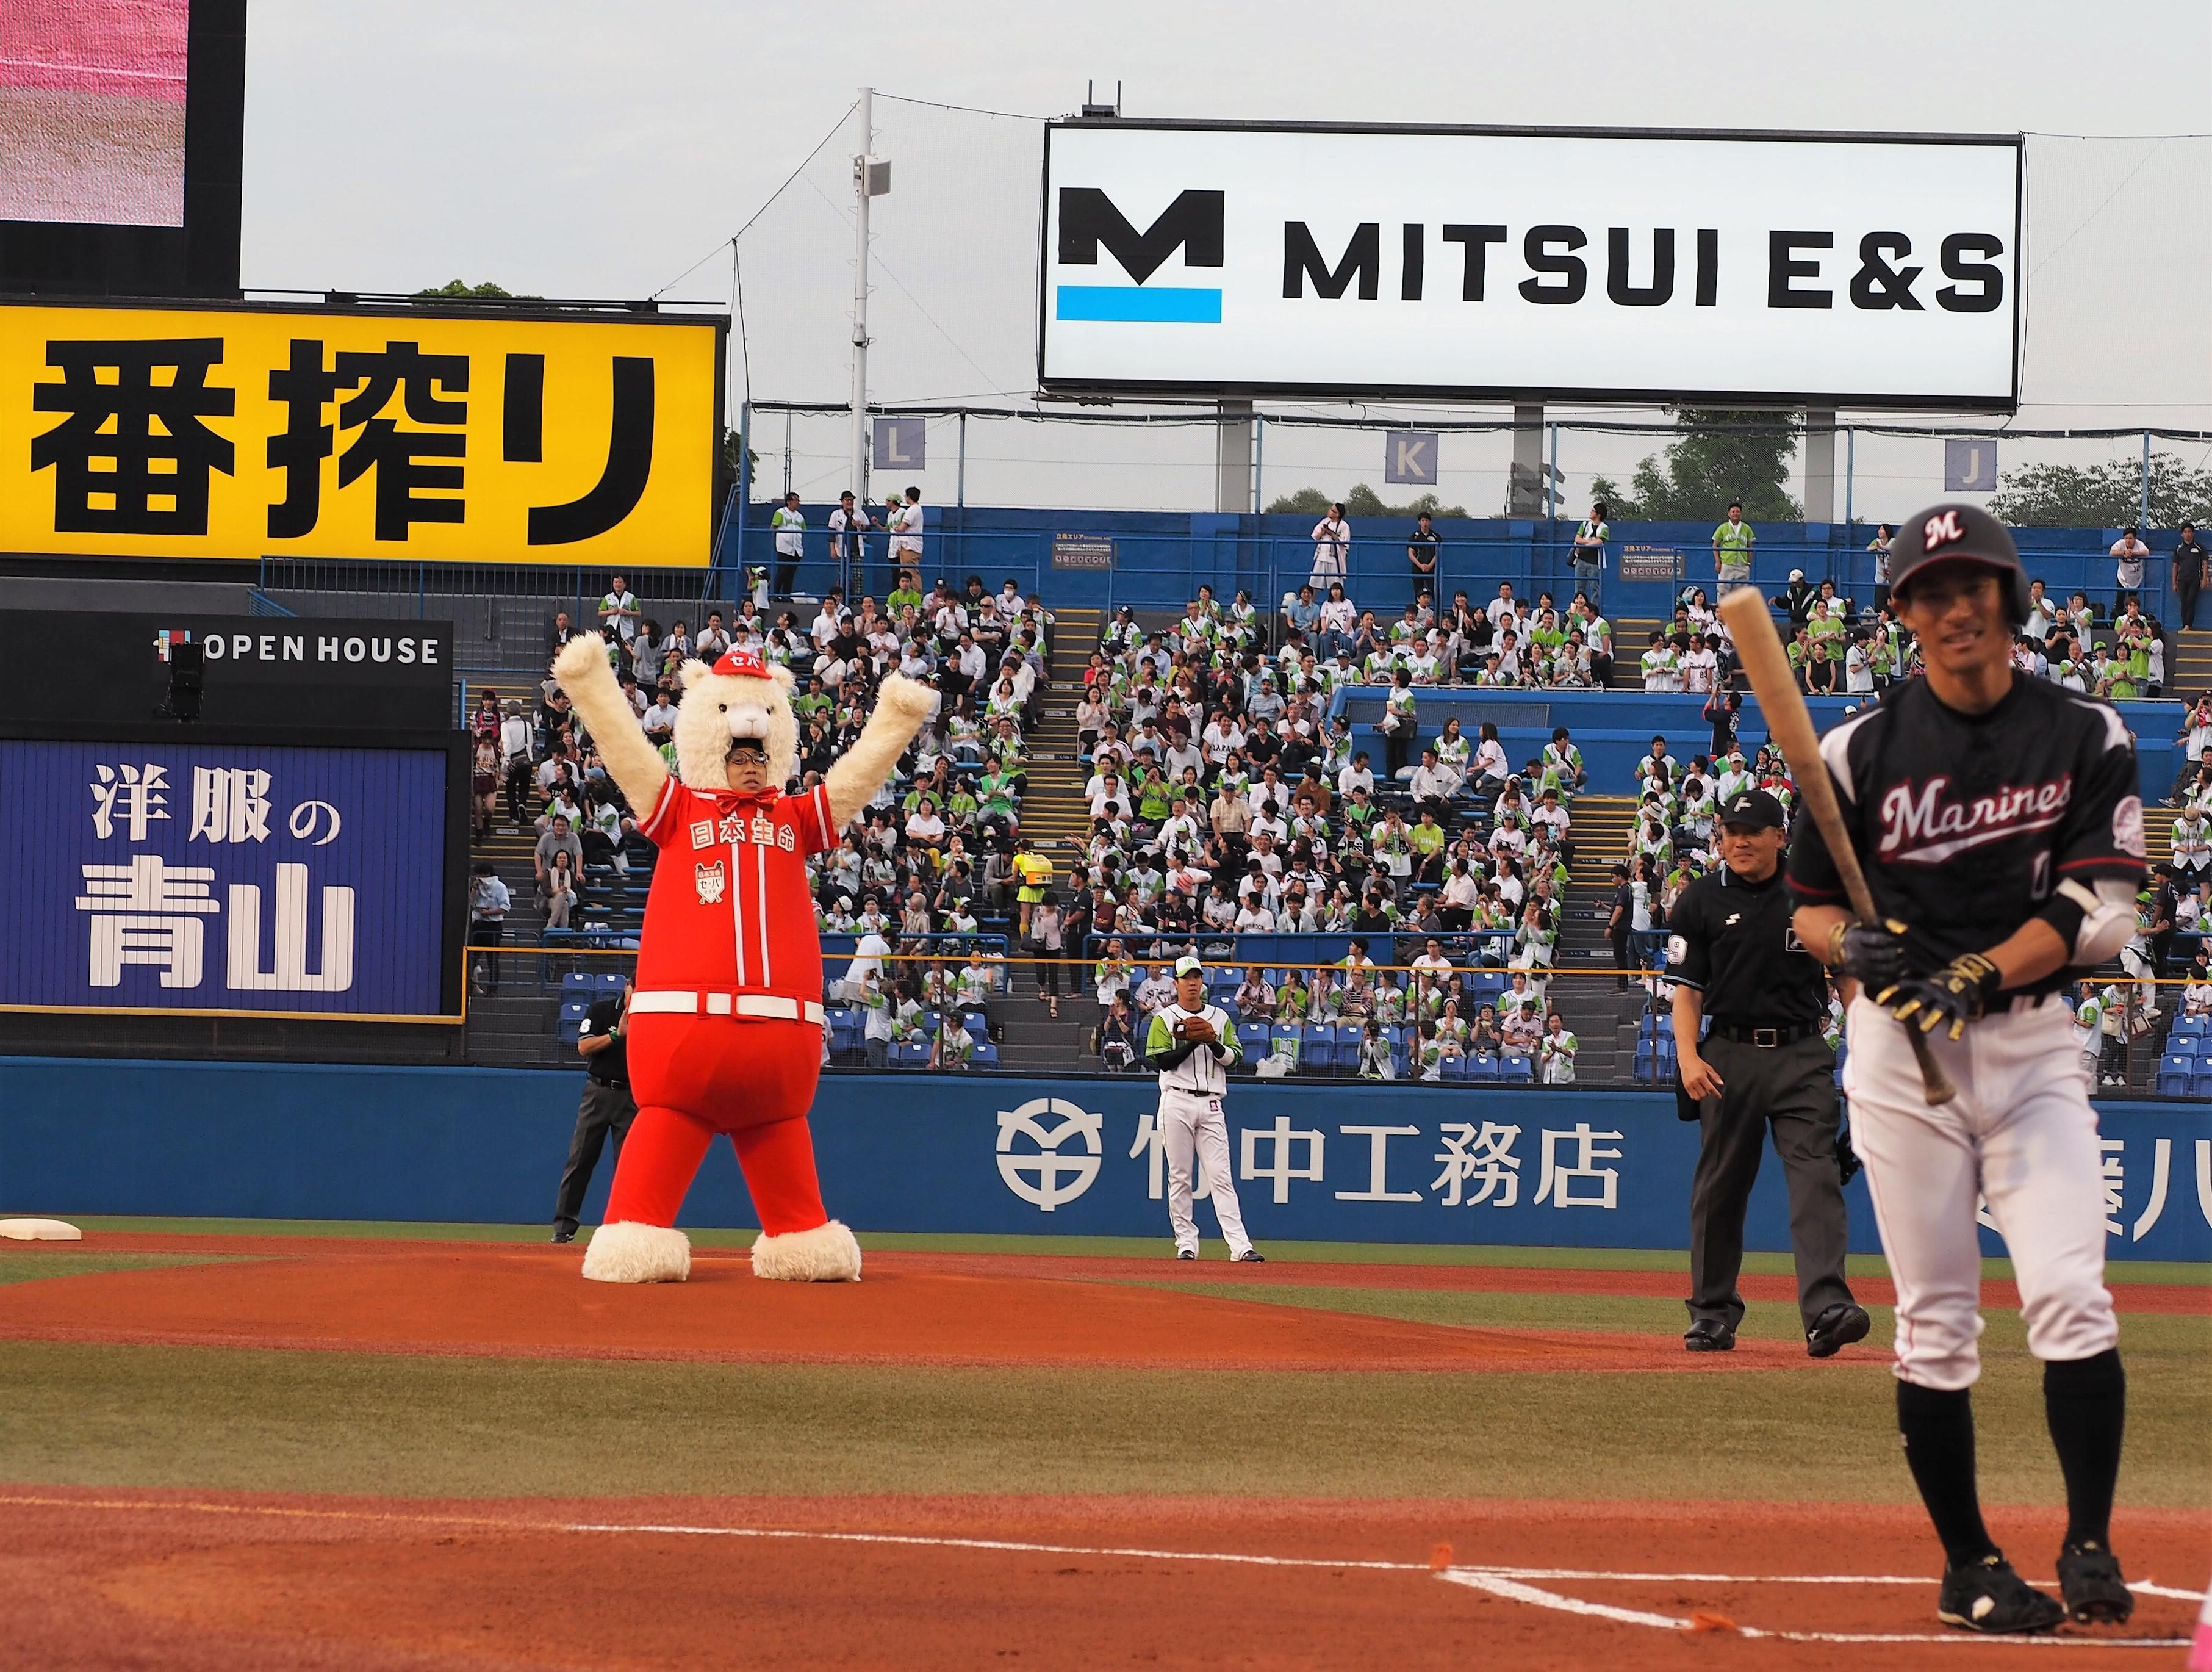 http://news.yoshimoto.co.jp/20180530065433-b30b43ceac8b175b4db3895c8edf3dec2b29589c.jpg